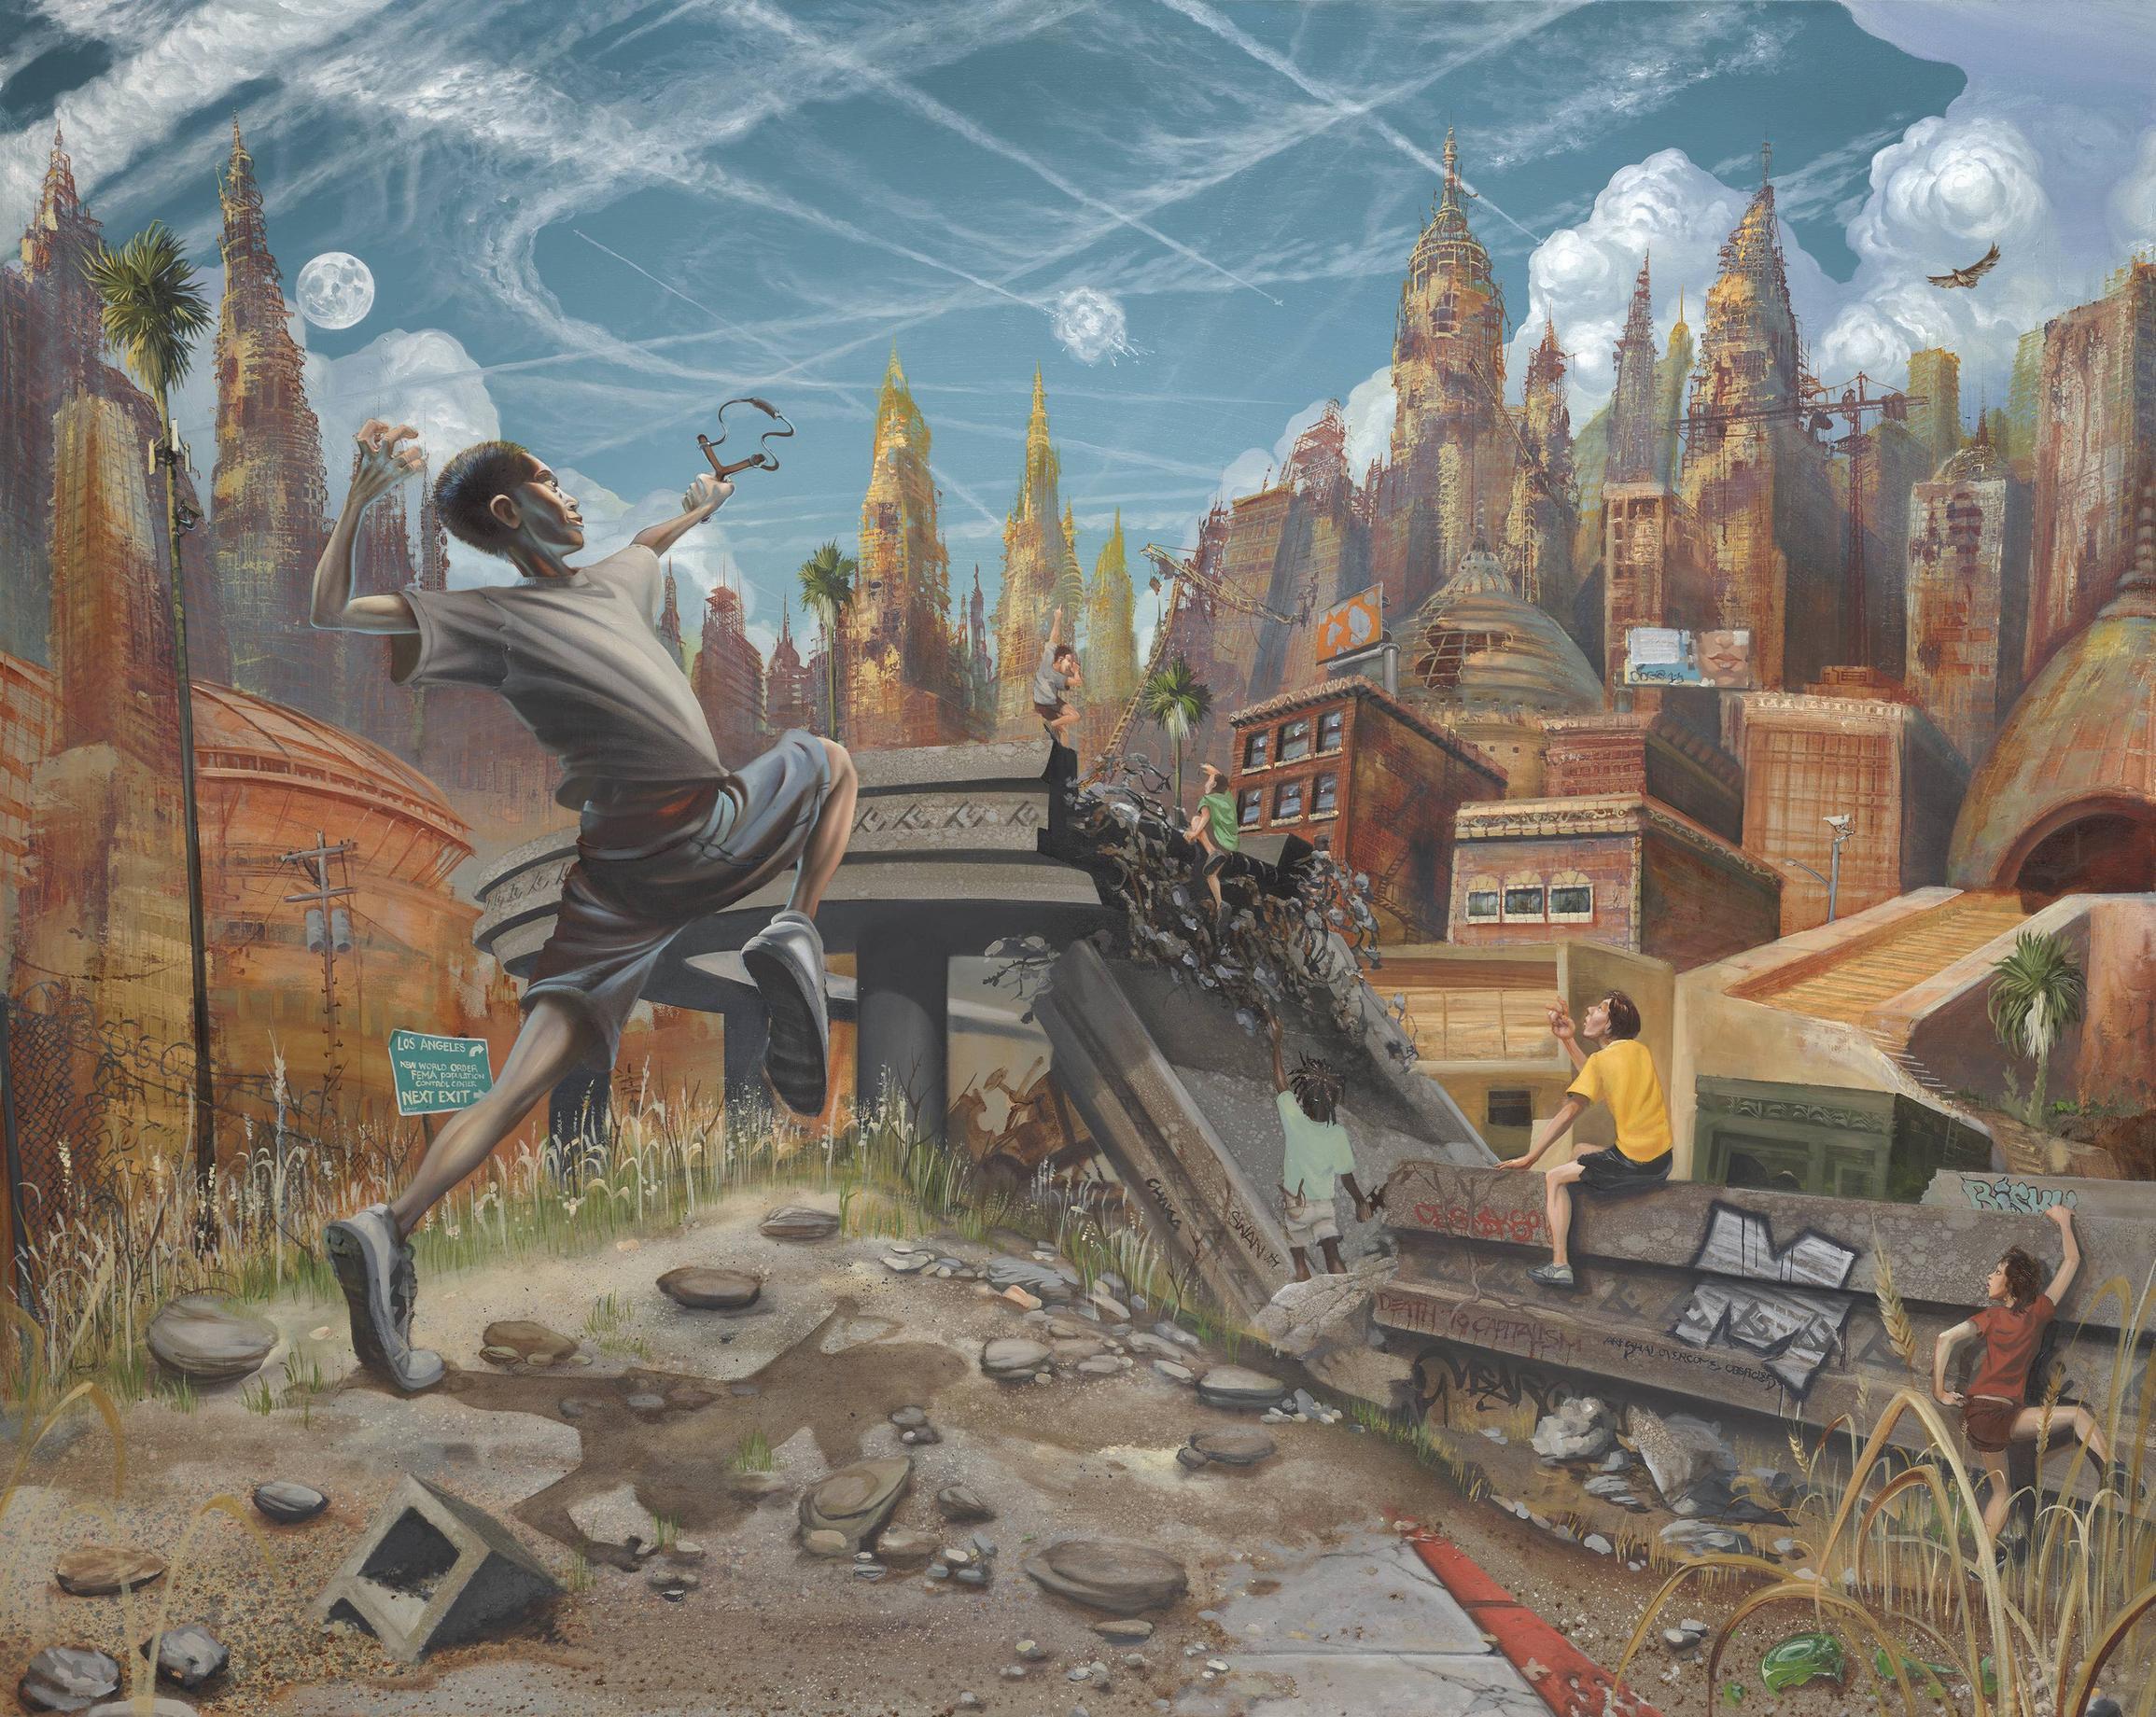 Freeport - David & Goliath 33/100